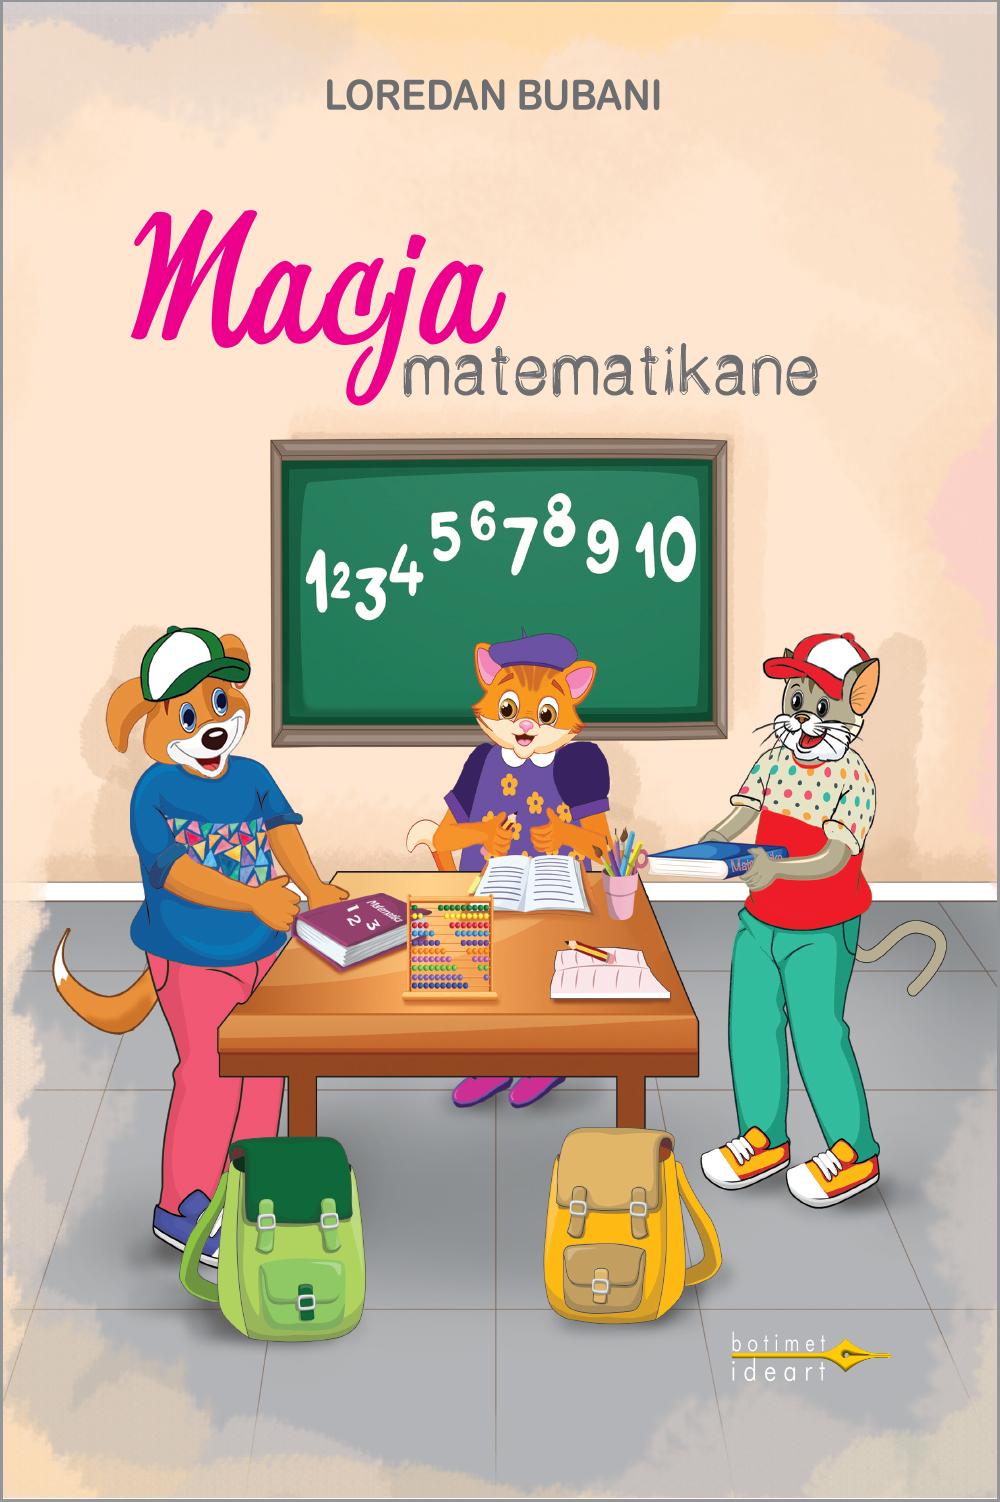 Macja matematikane